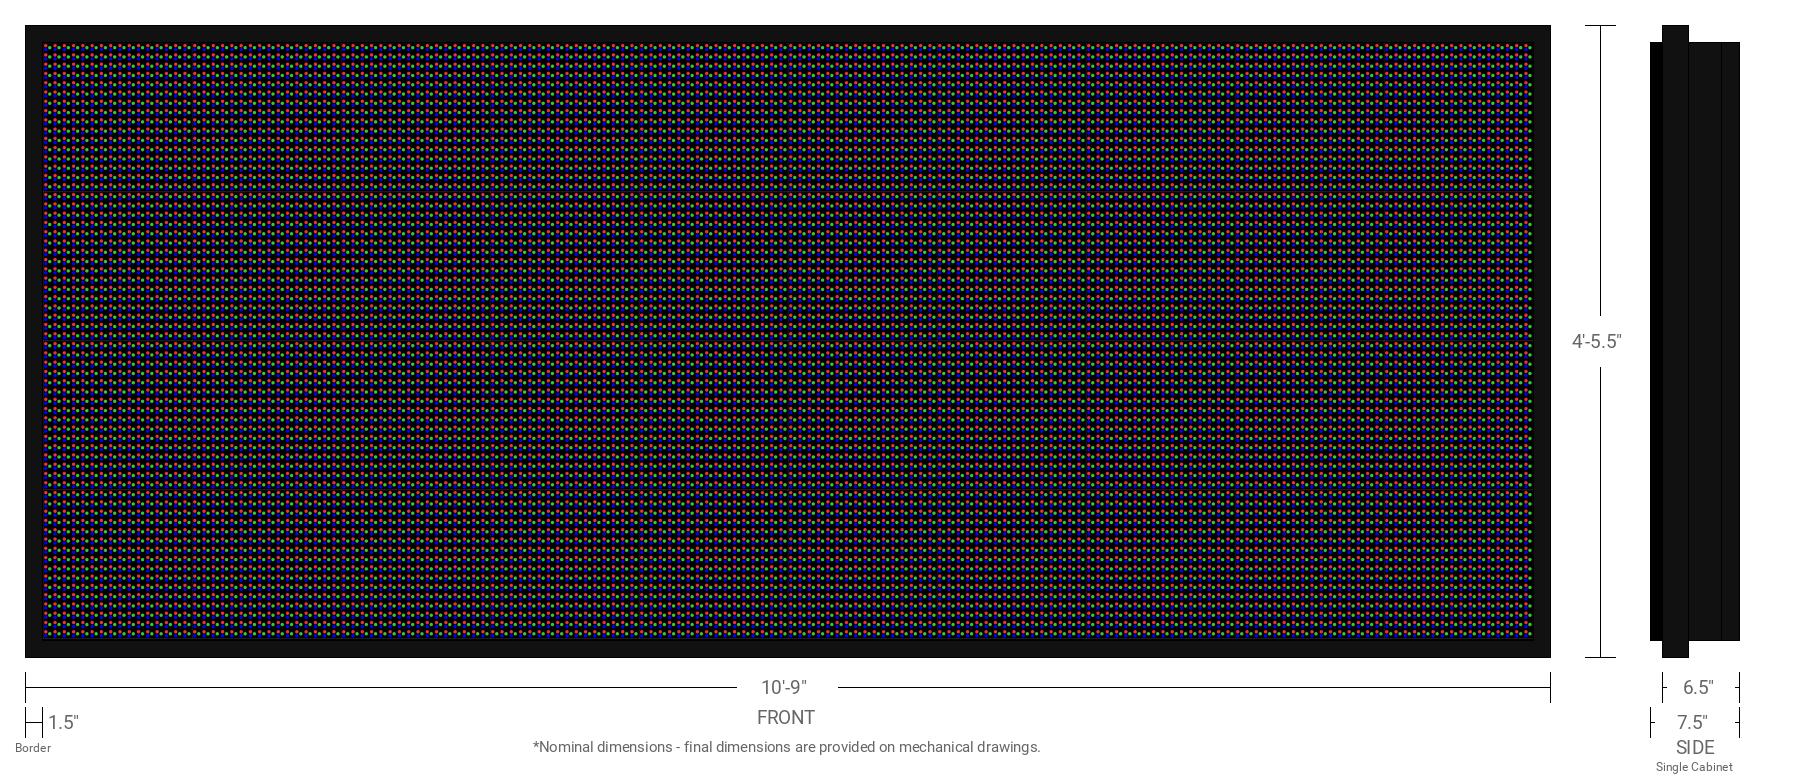 Aurora 20mm 64x160 Single Sided Full Color LED Display